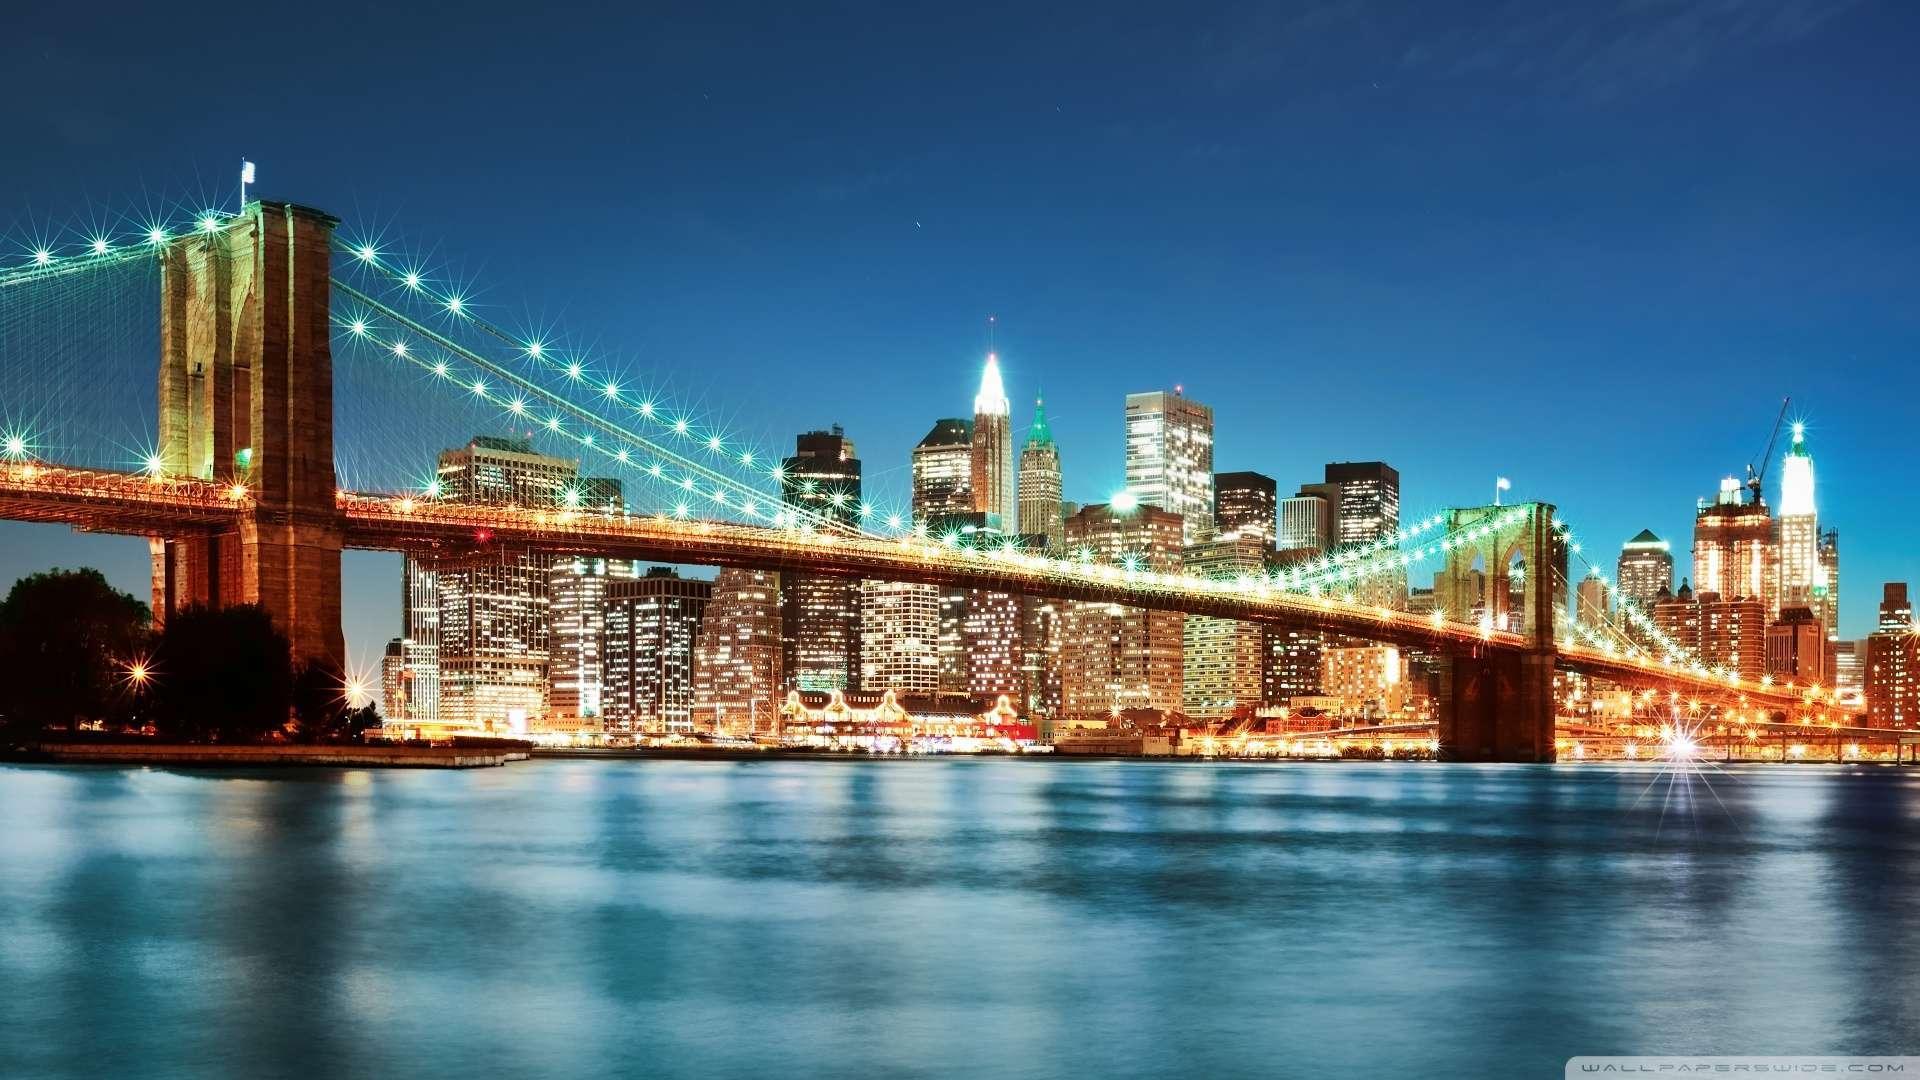 City Wallpaper Hd 1080p Free Download Nosirix